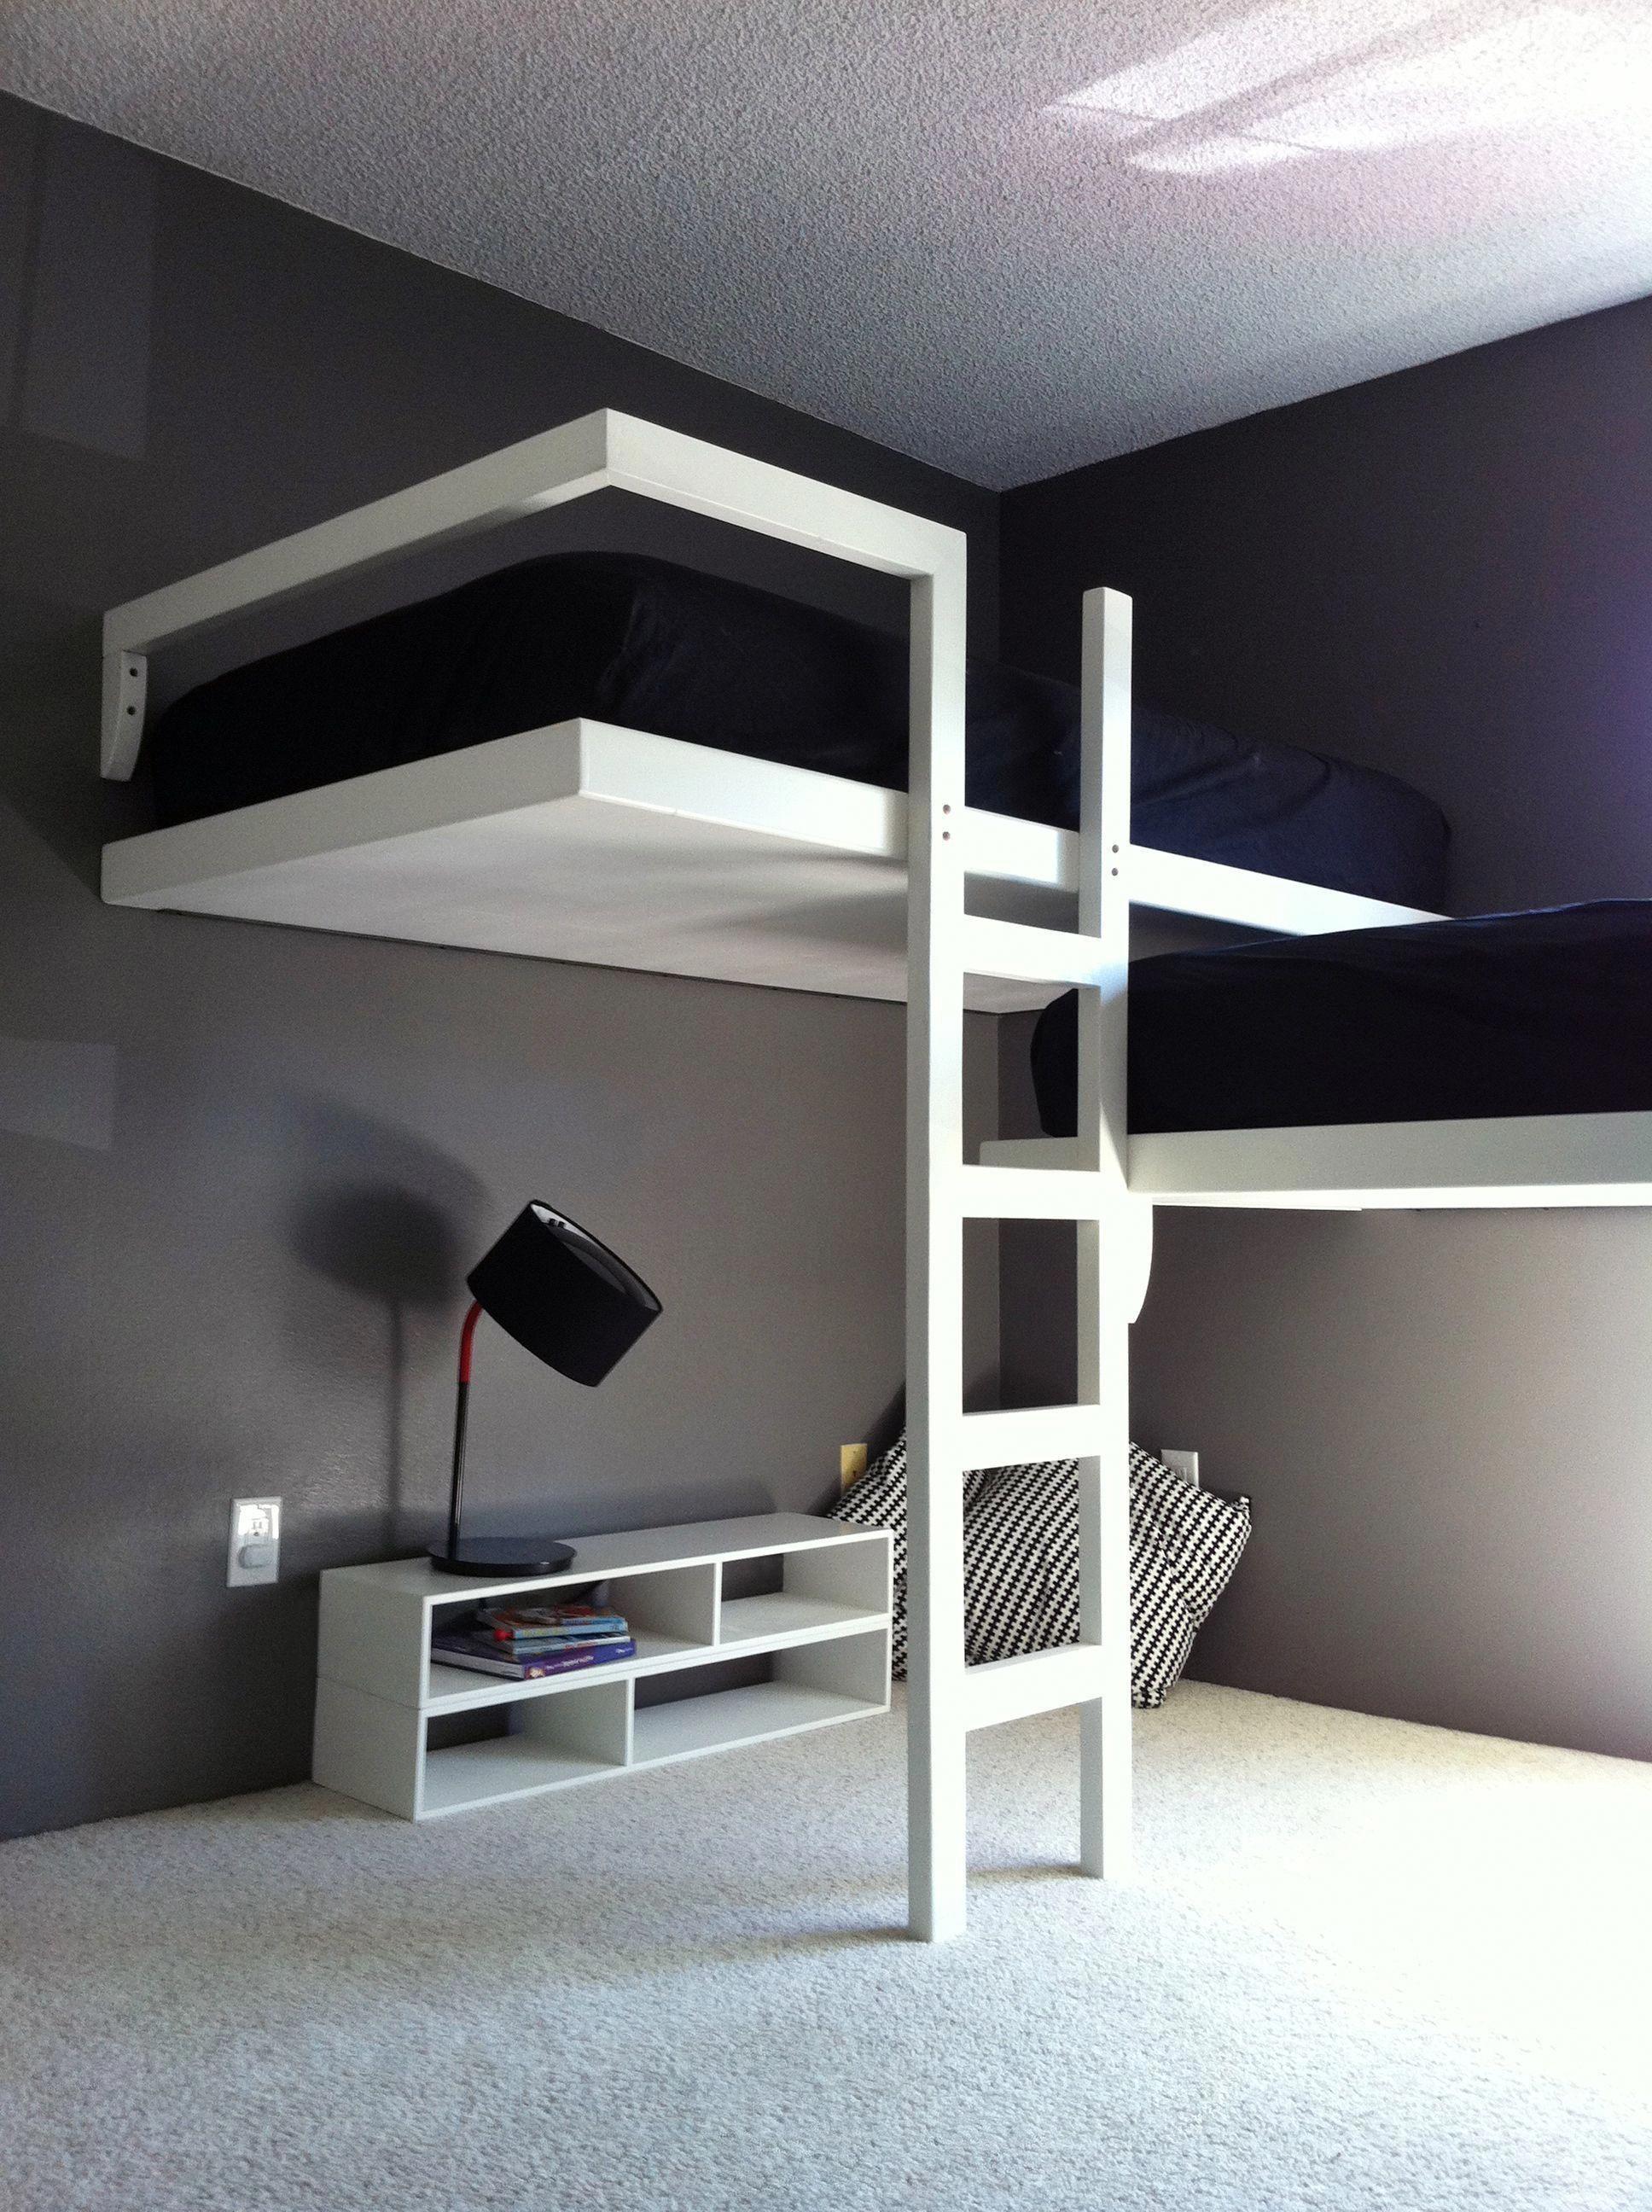 Design Fab Llc Cool Puter Setups And Gaming Loft Bed Setup